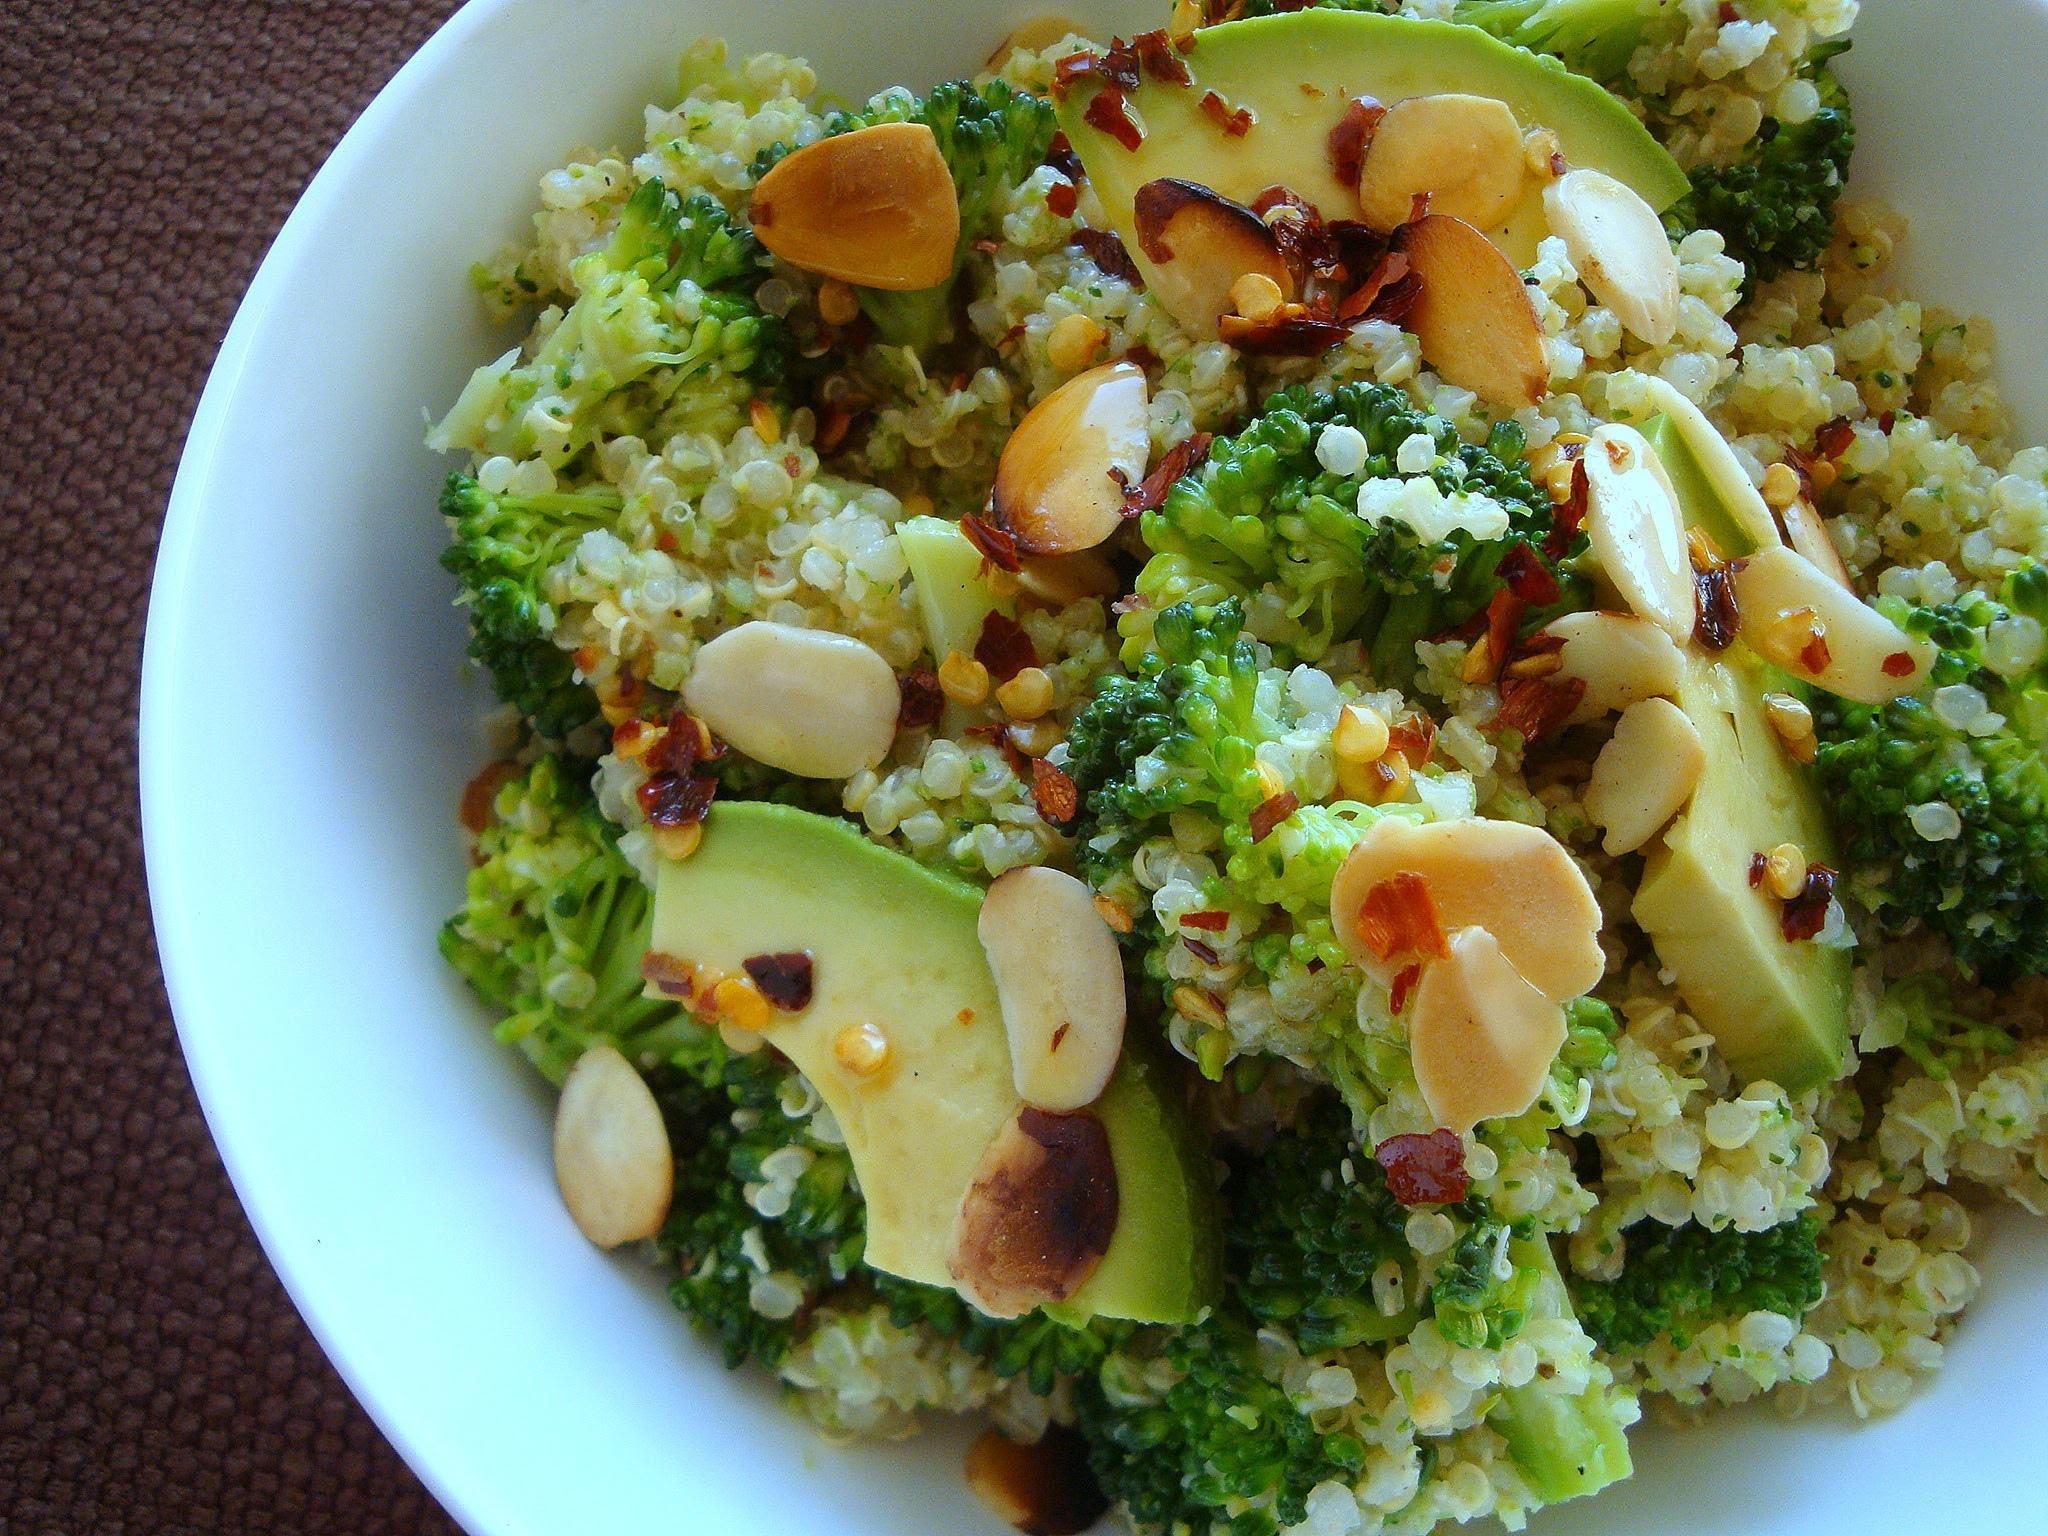 Ensalada de quinoa y lenteja